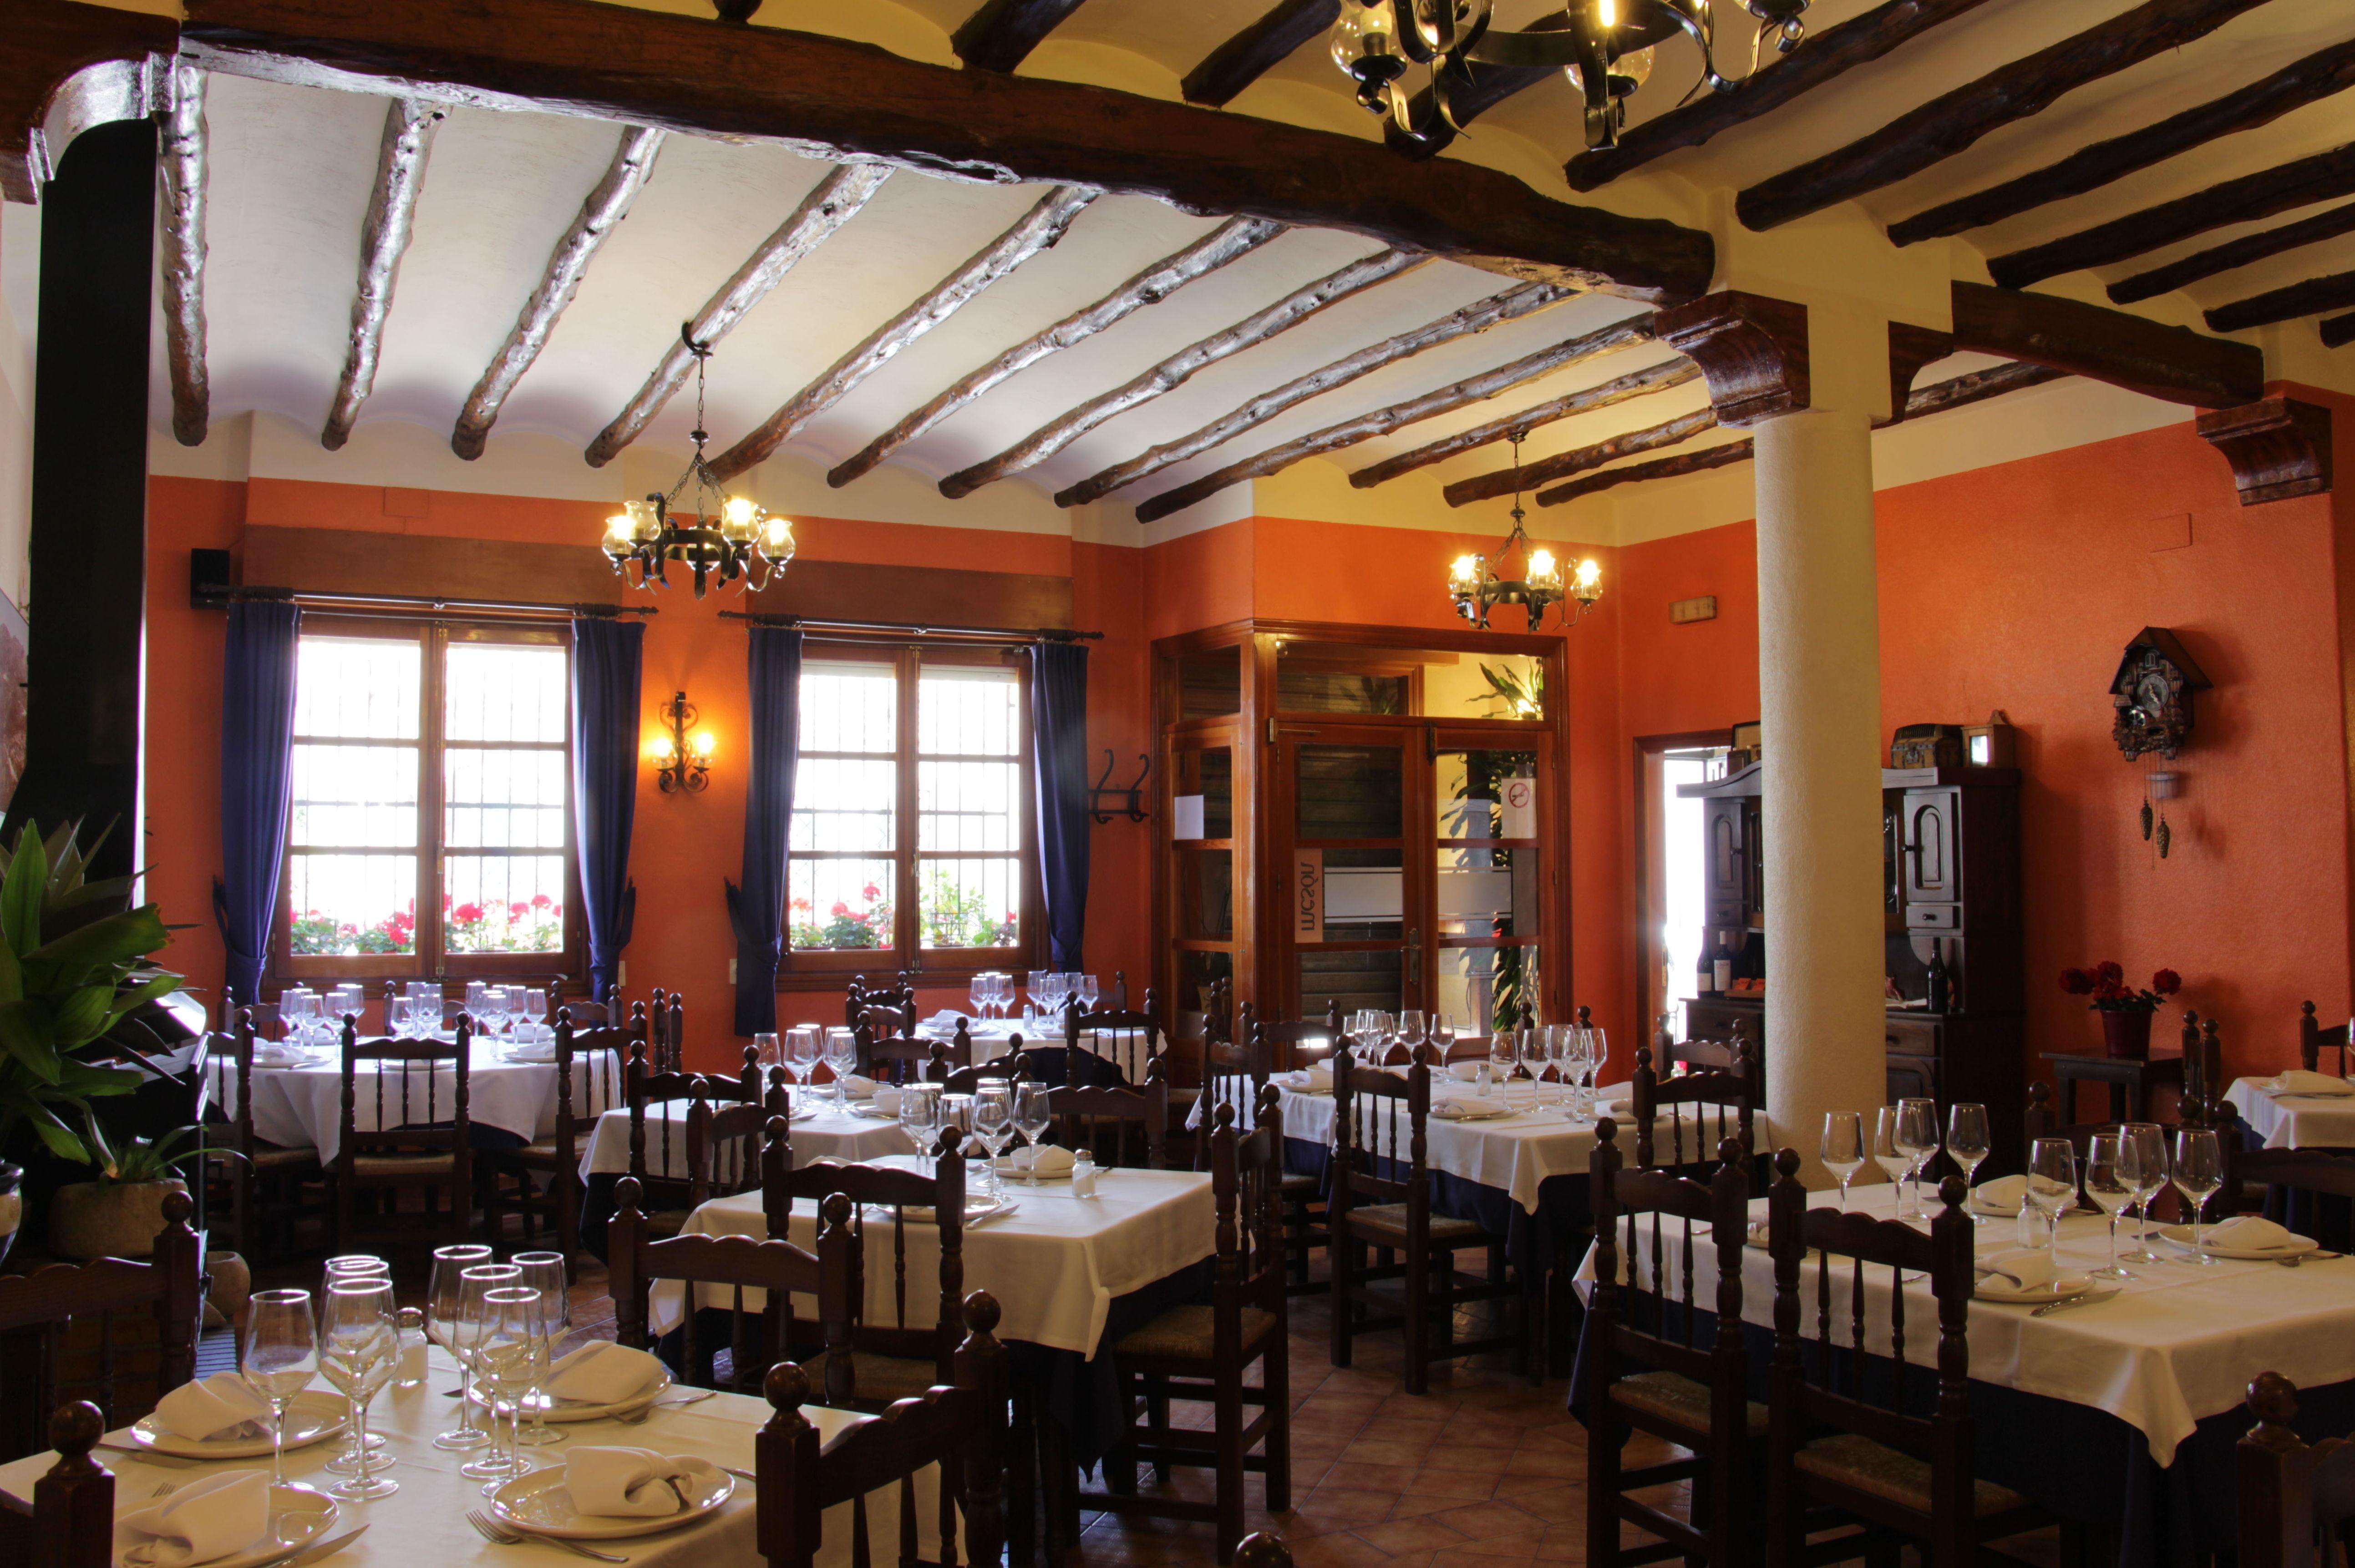 Foto 2 de Mesón - restaurante en Benimantell | Mesón Ca Rafel